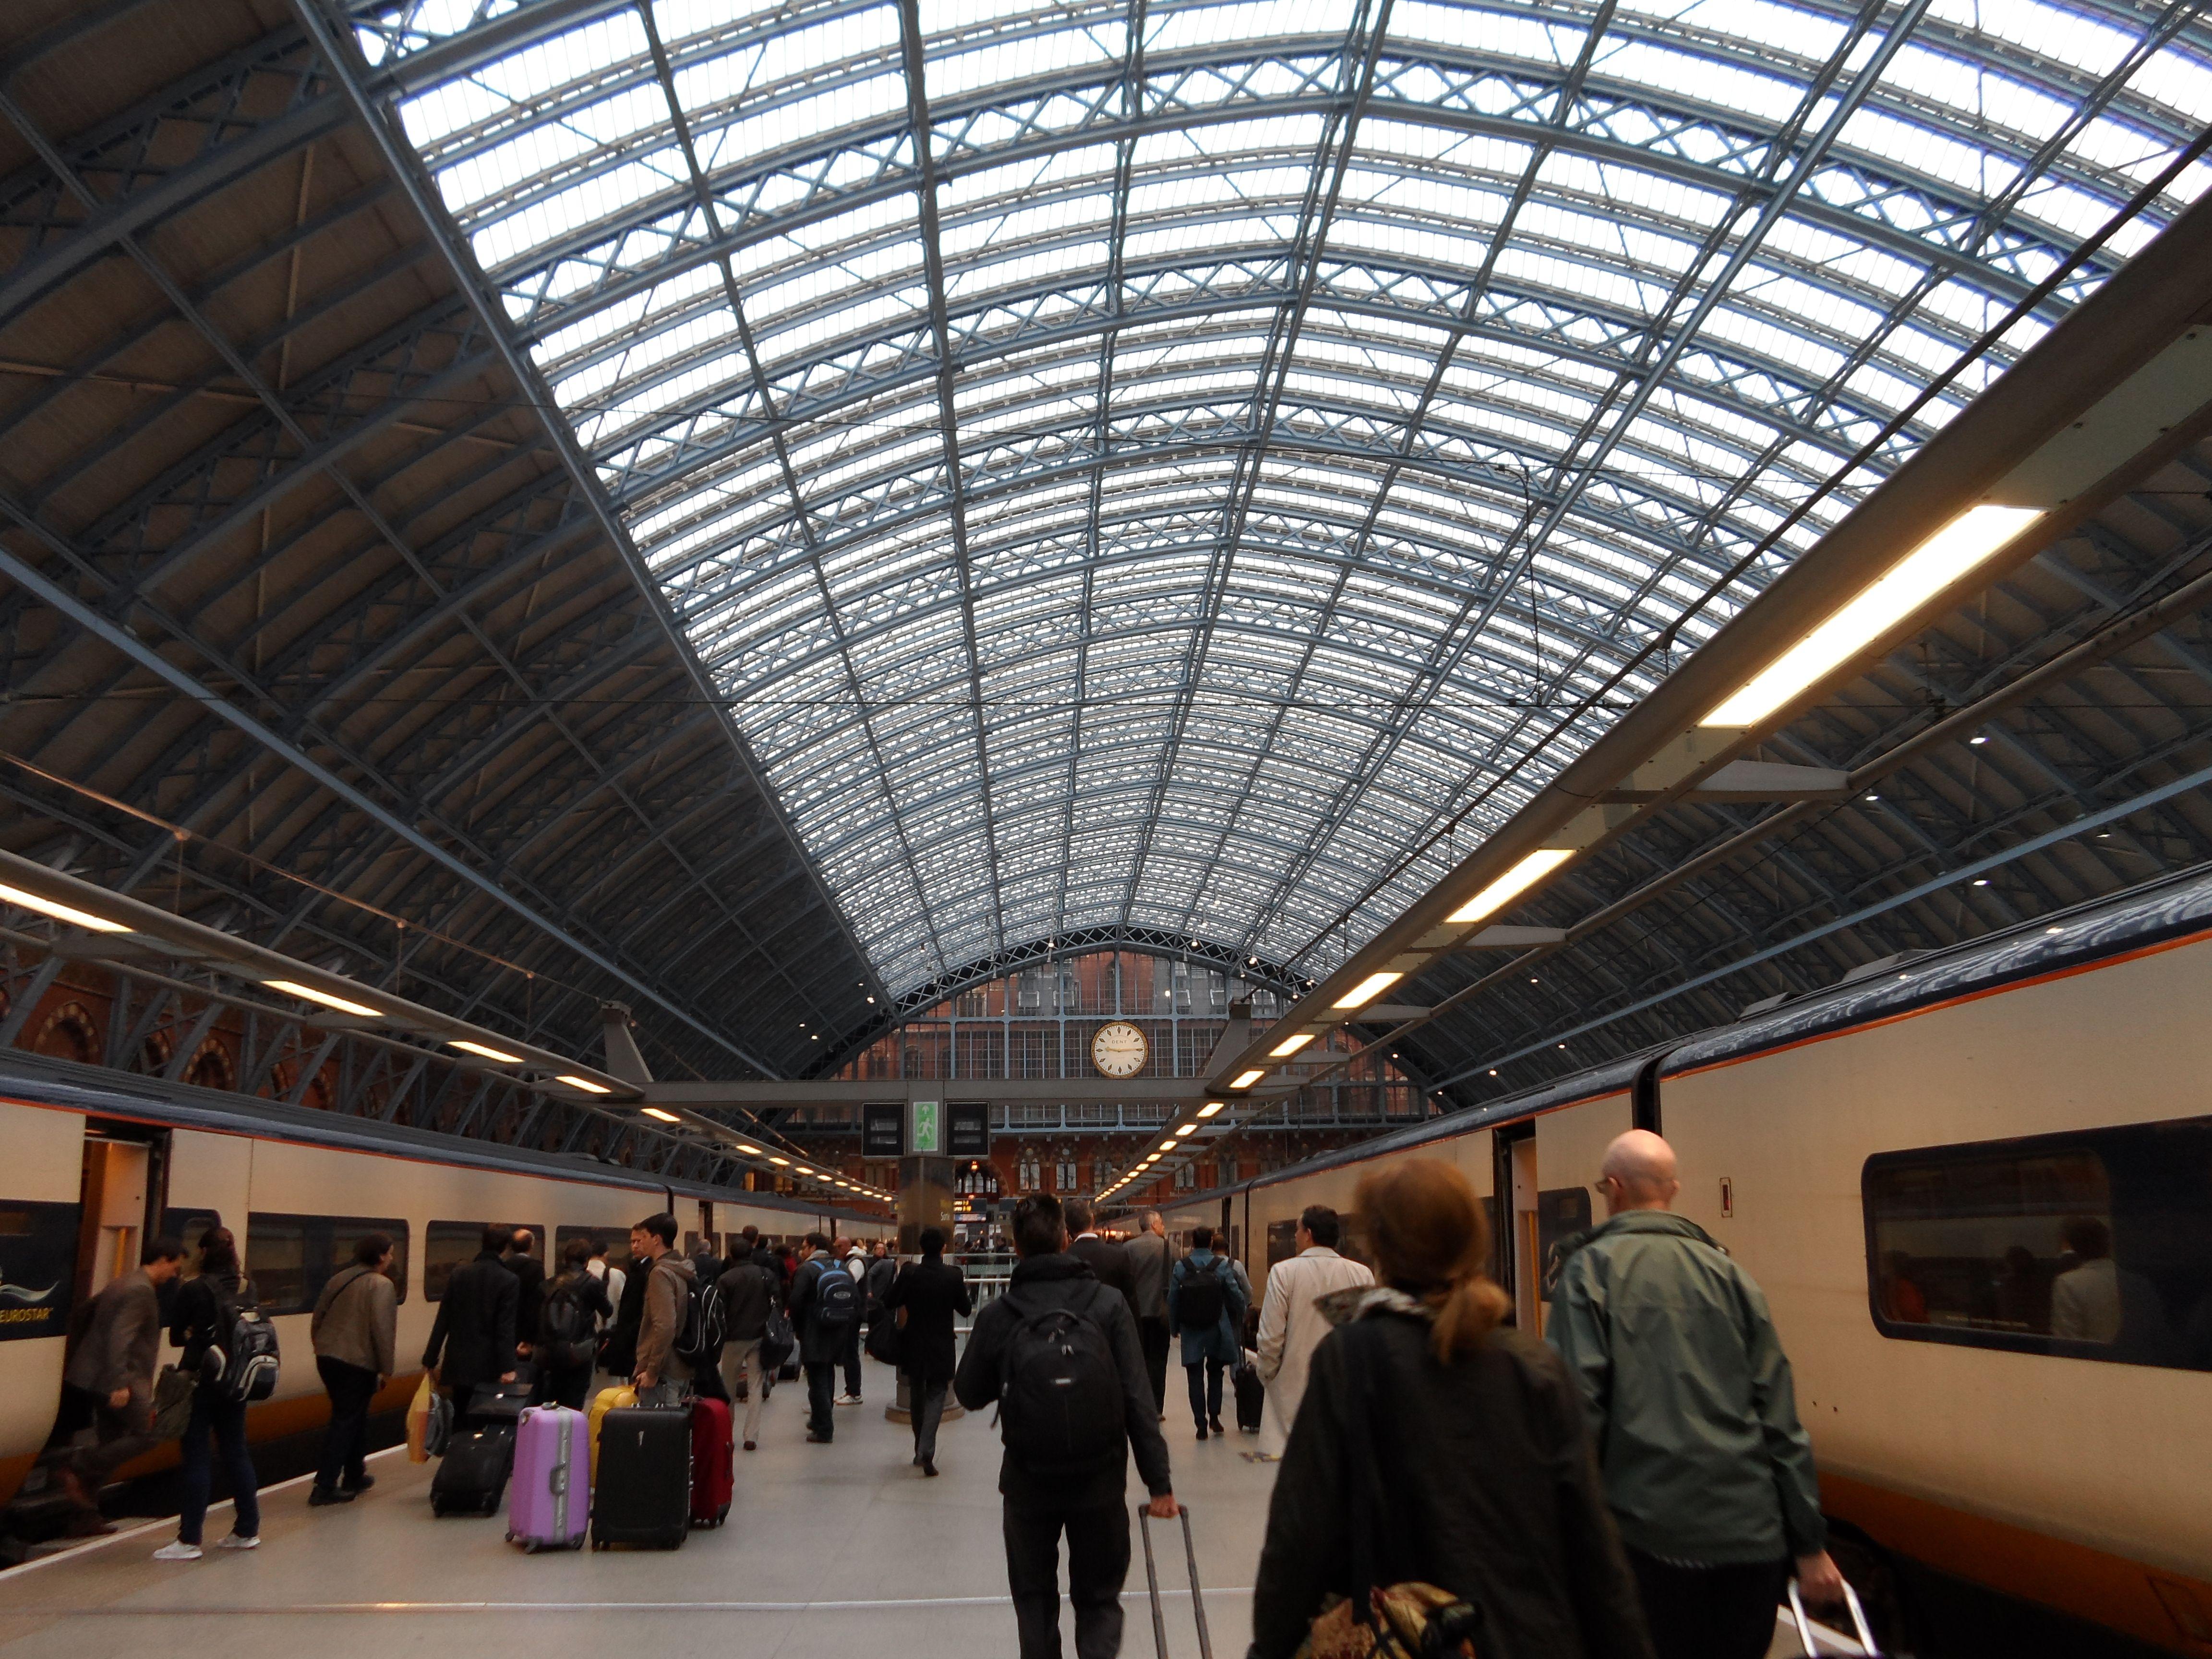 london to paris eurostar train station places to go. Black Bedroom Furniture Sets. Home Design Ideas